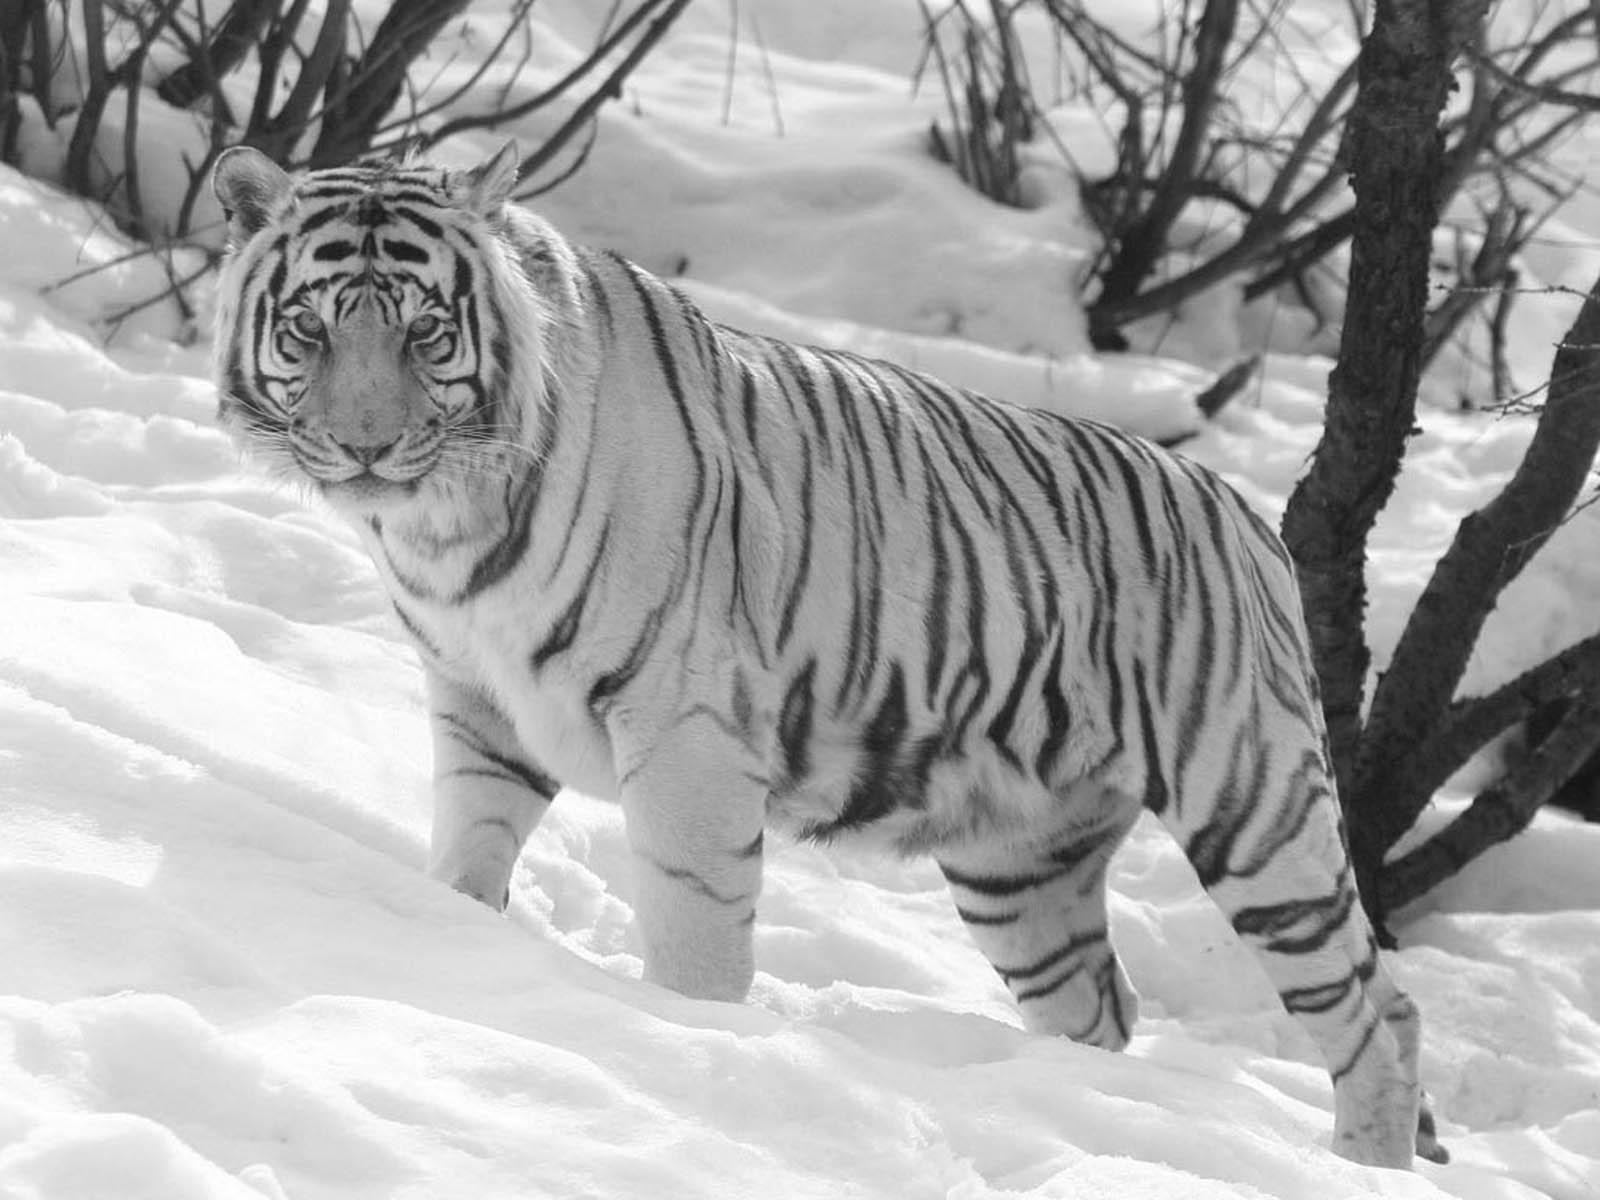 the white tiger wallpapers white tiger desktop wallpapers white tiger 1600x1200